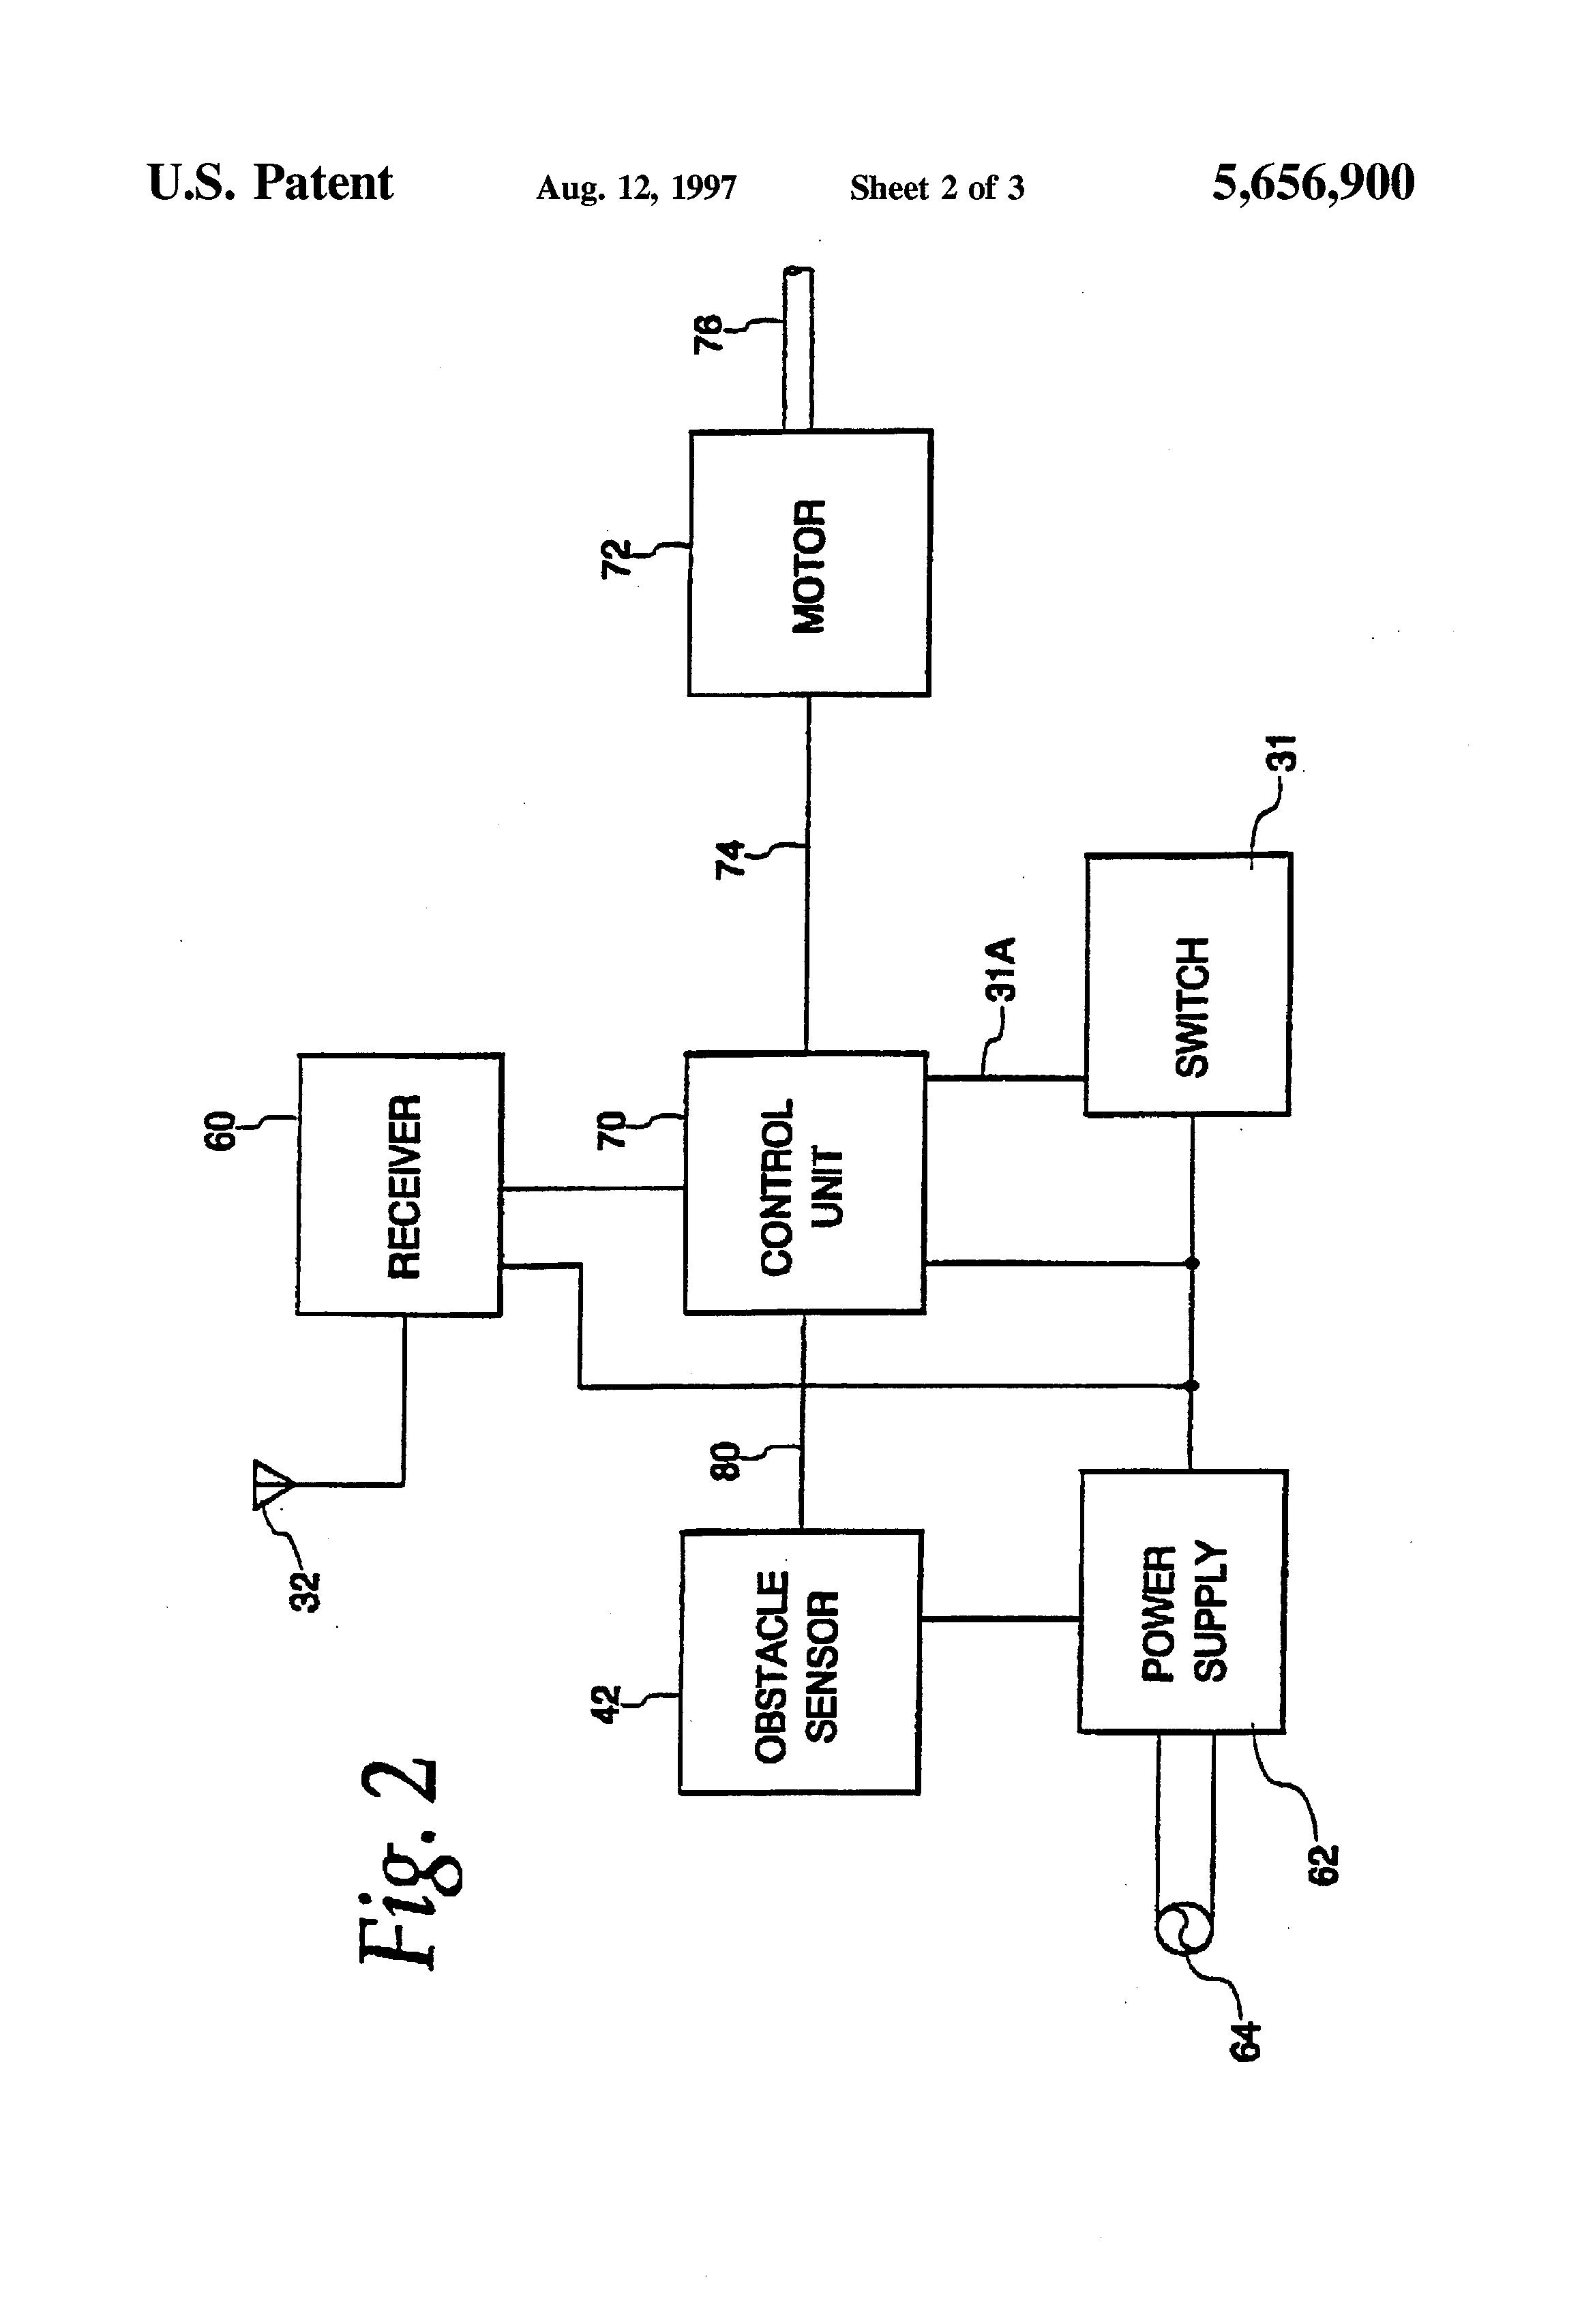 patent us5656900 - retro-reflective infrared safety sensor for garage door operators